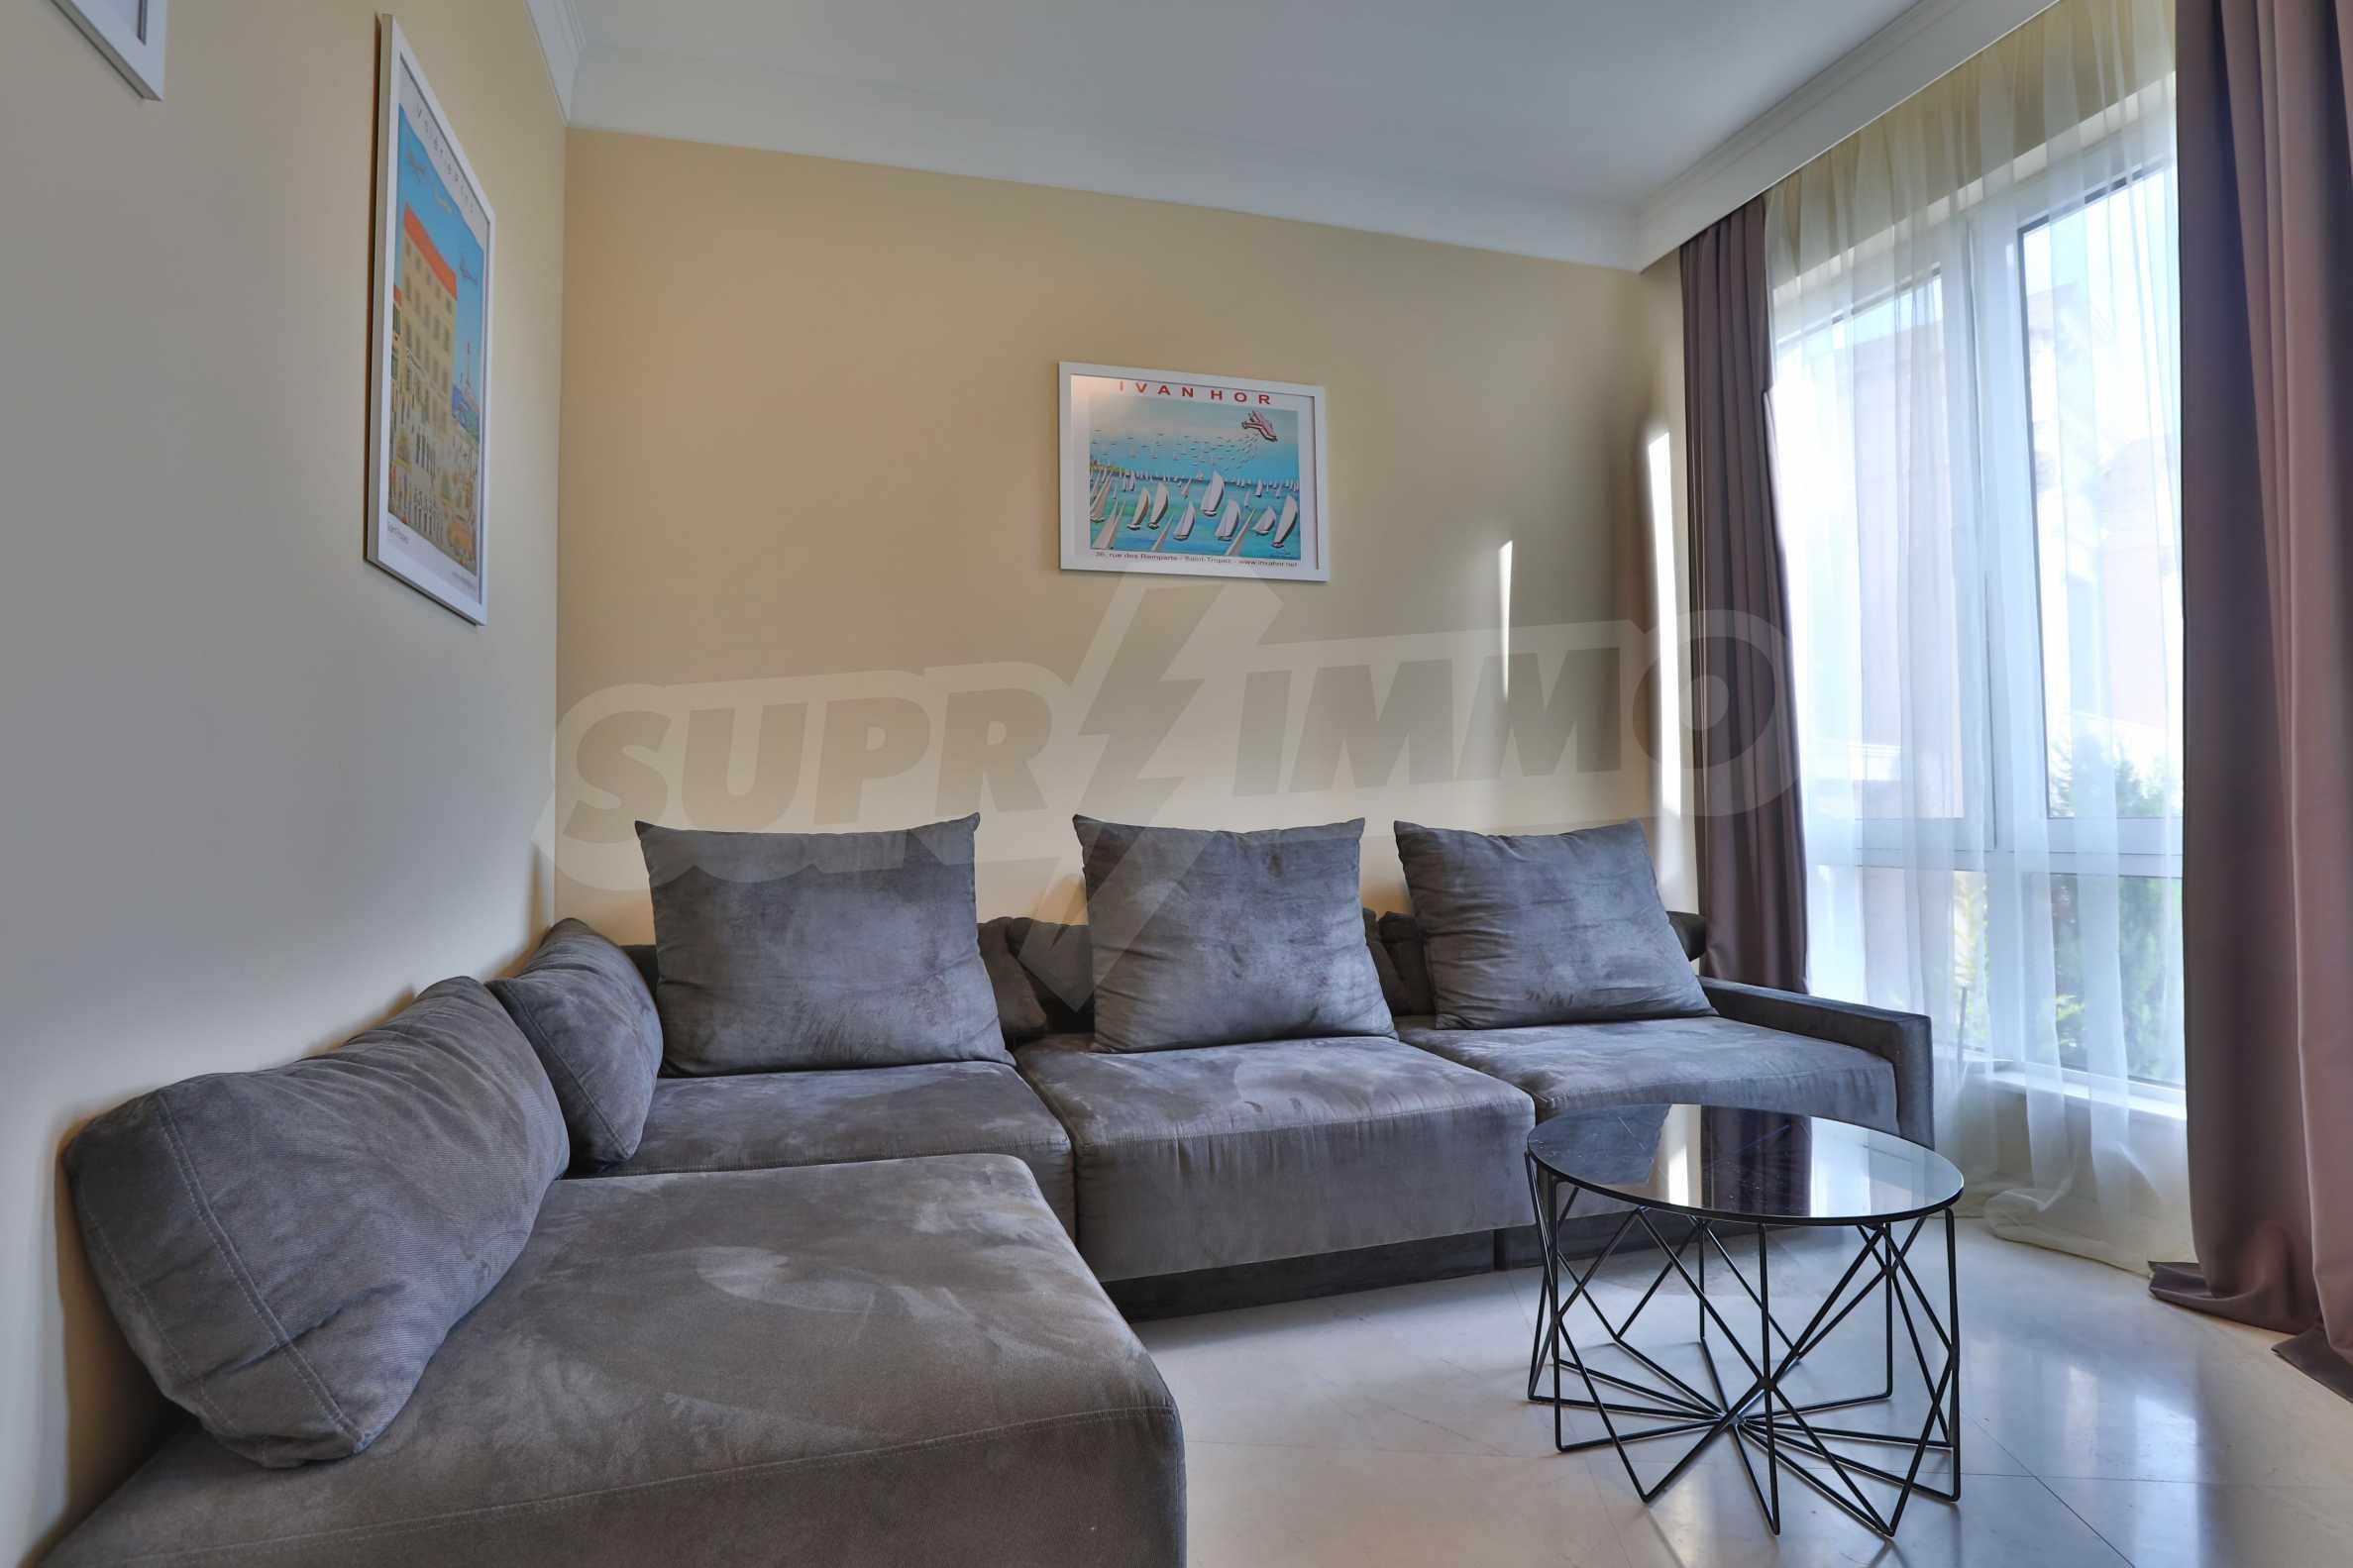 Дизайнерски тристаен апартамент под наем за летен сезон в резиденция Belle Époque в Лозенец 7